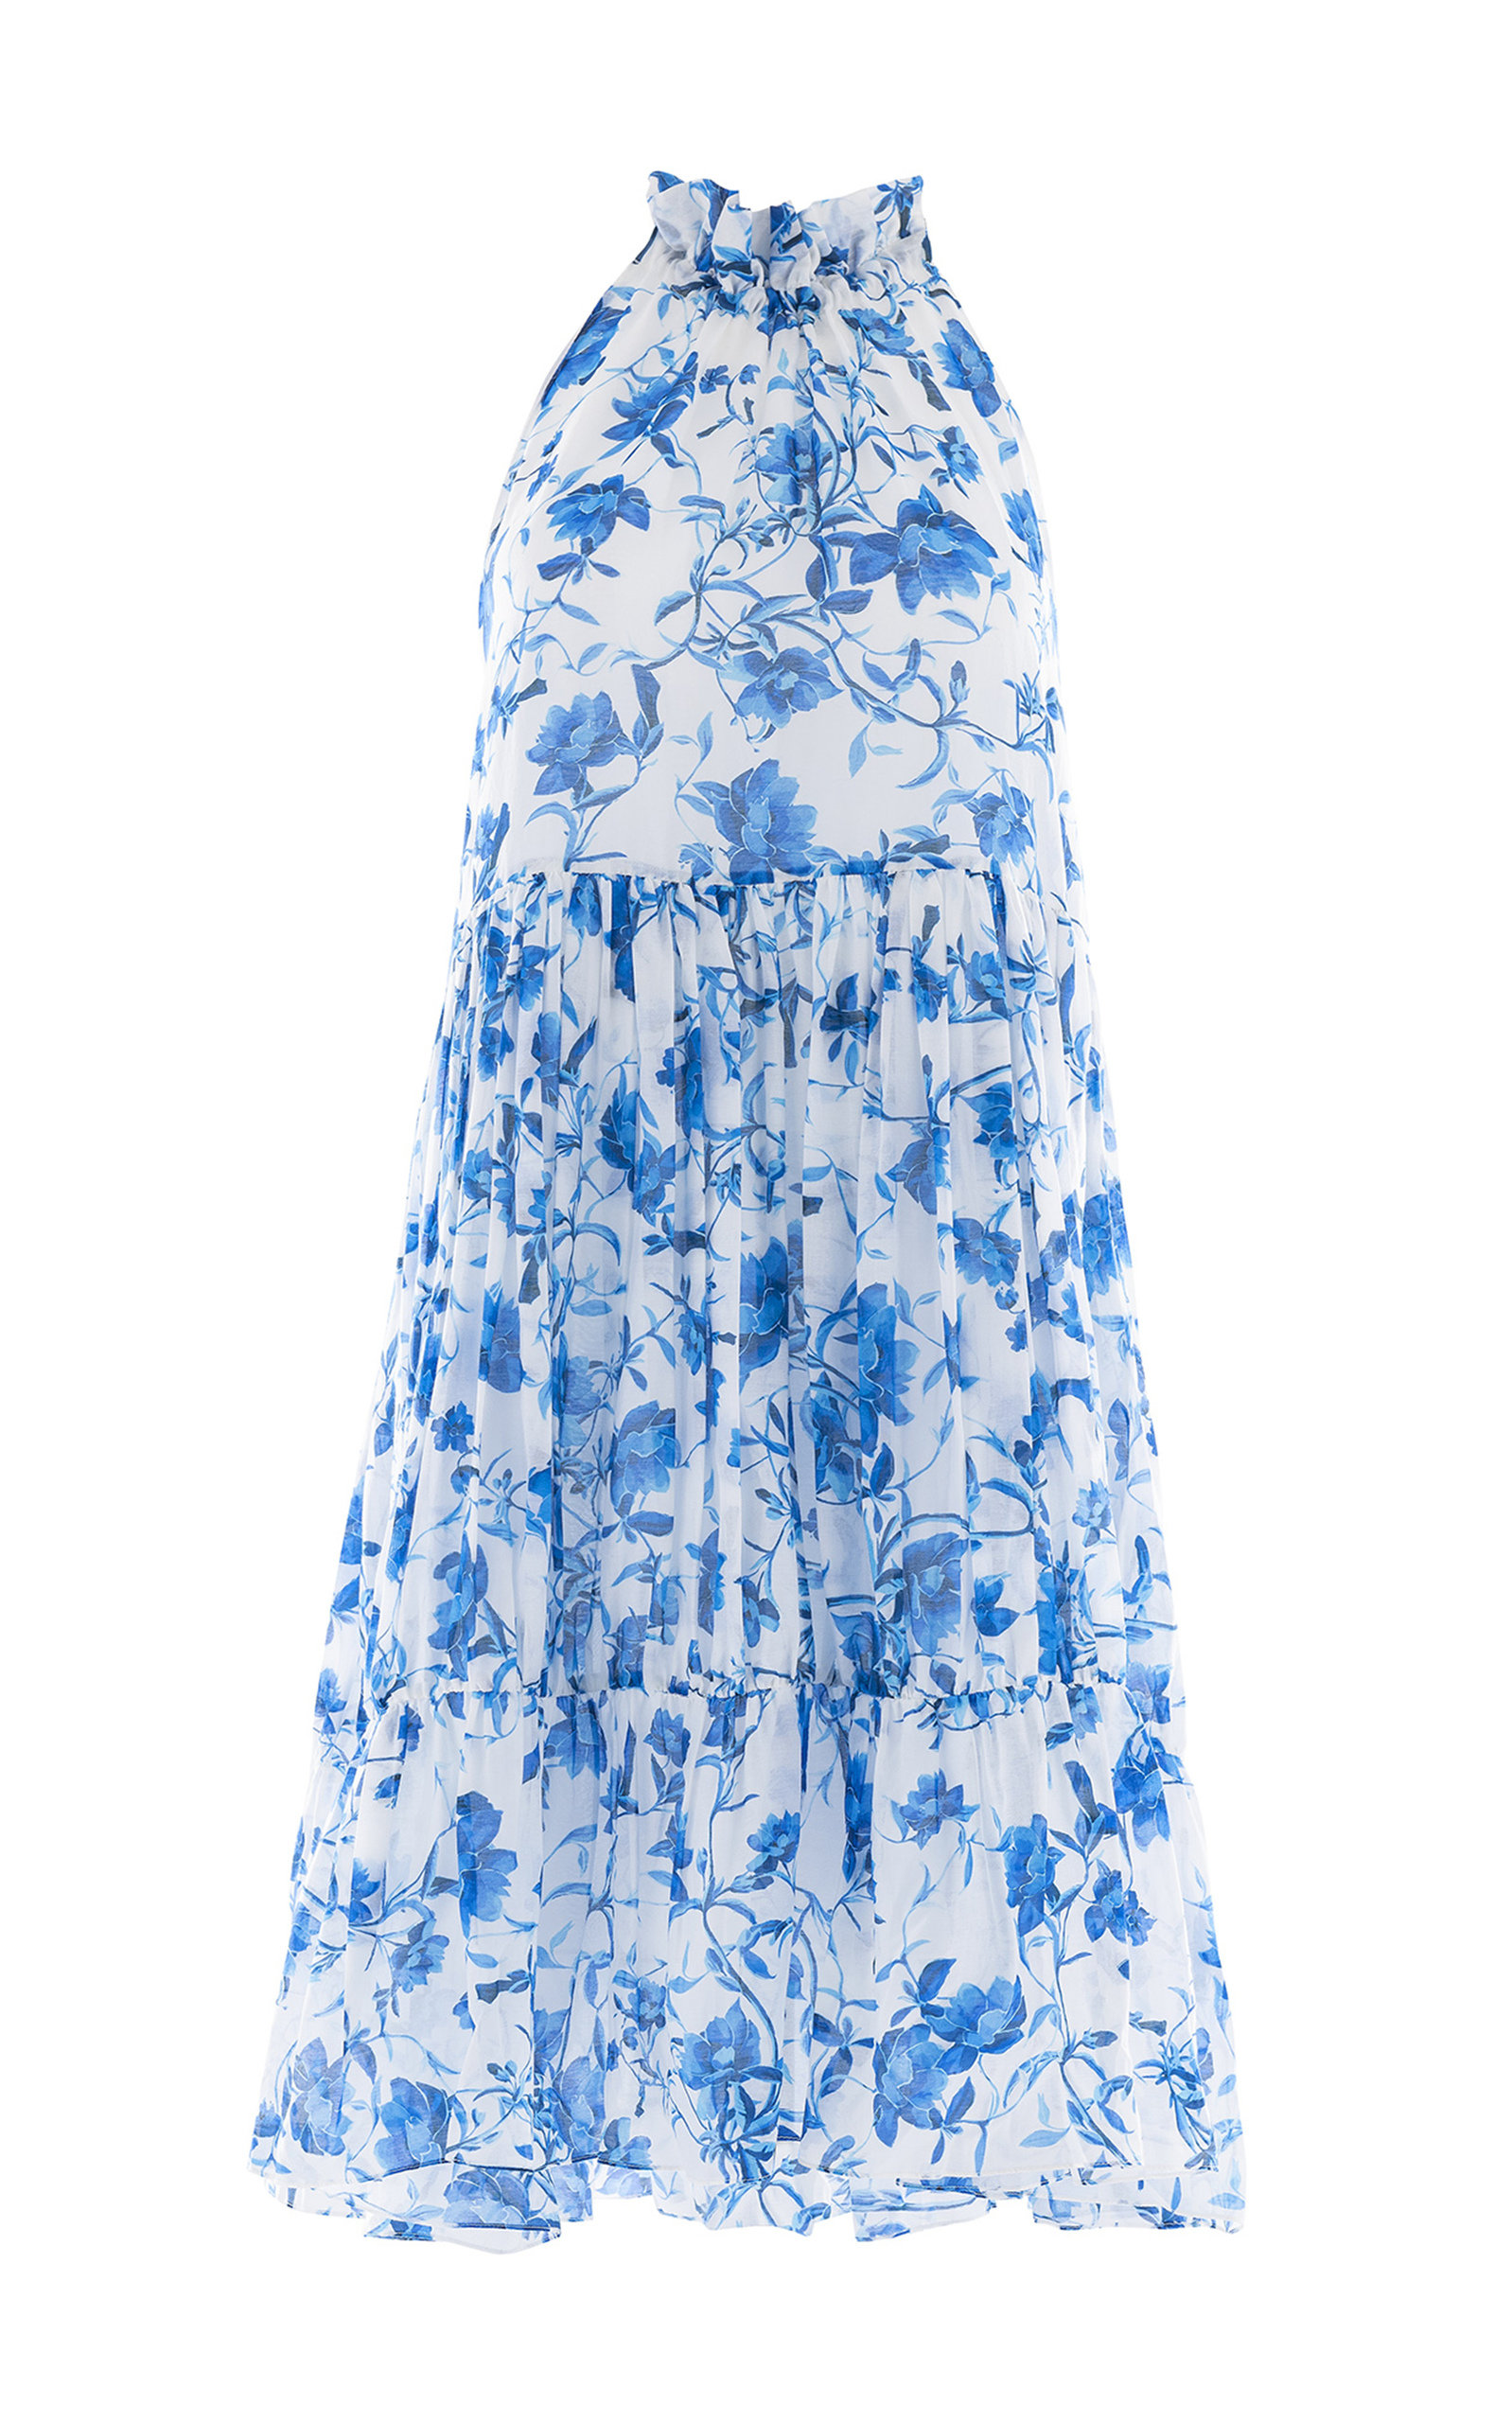 Women's Maggie Open Shoulder Mini Dress